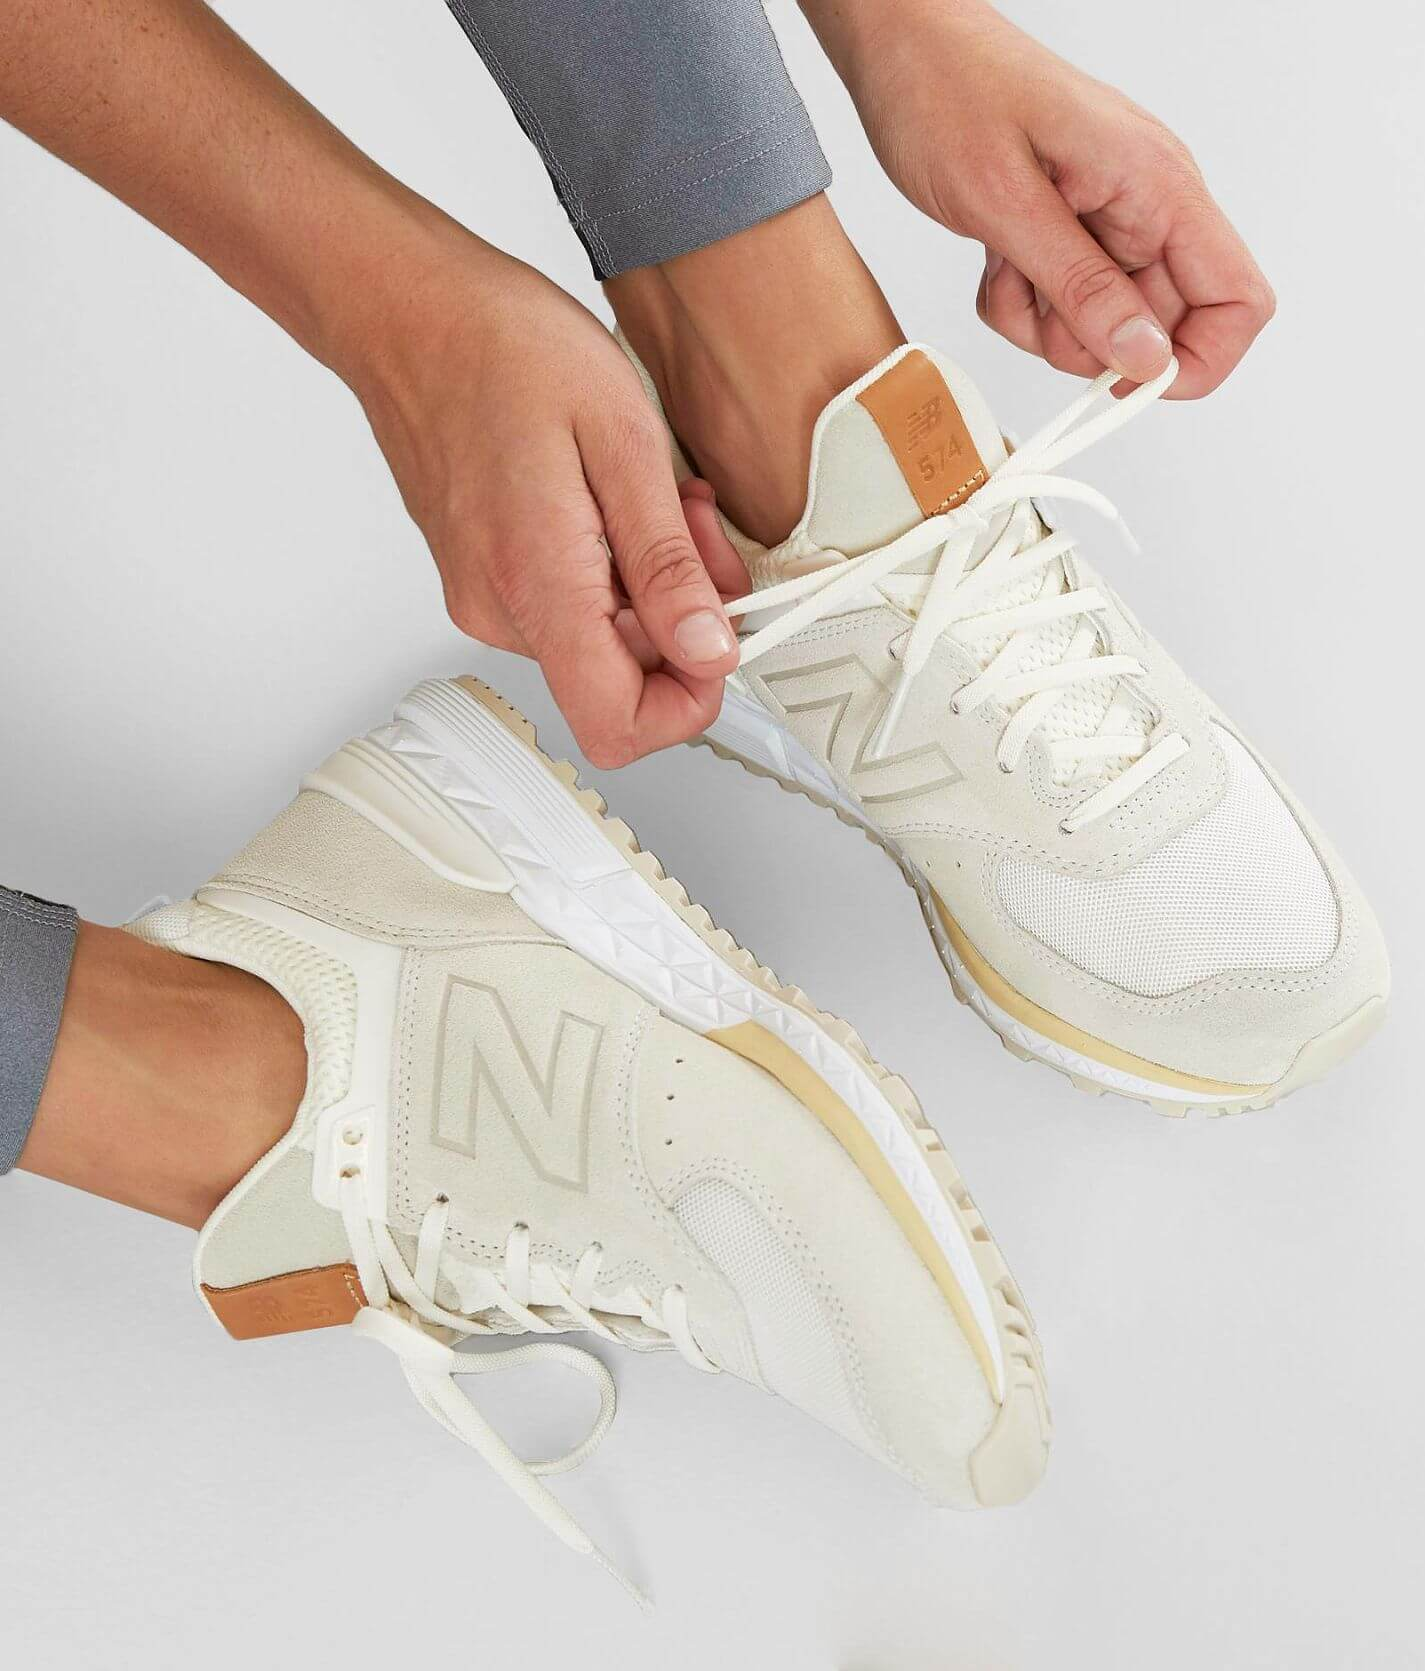 New Balance 574 Sport Shoe - Women's Shoes in Sea Salt Vanilla ...